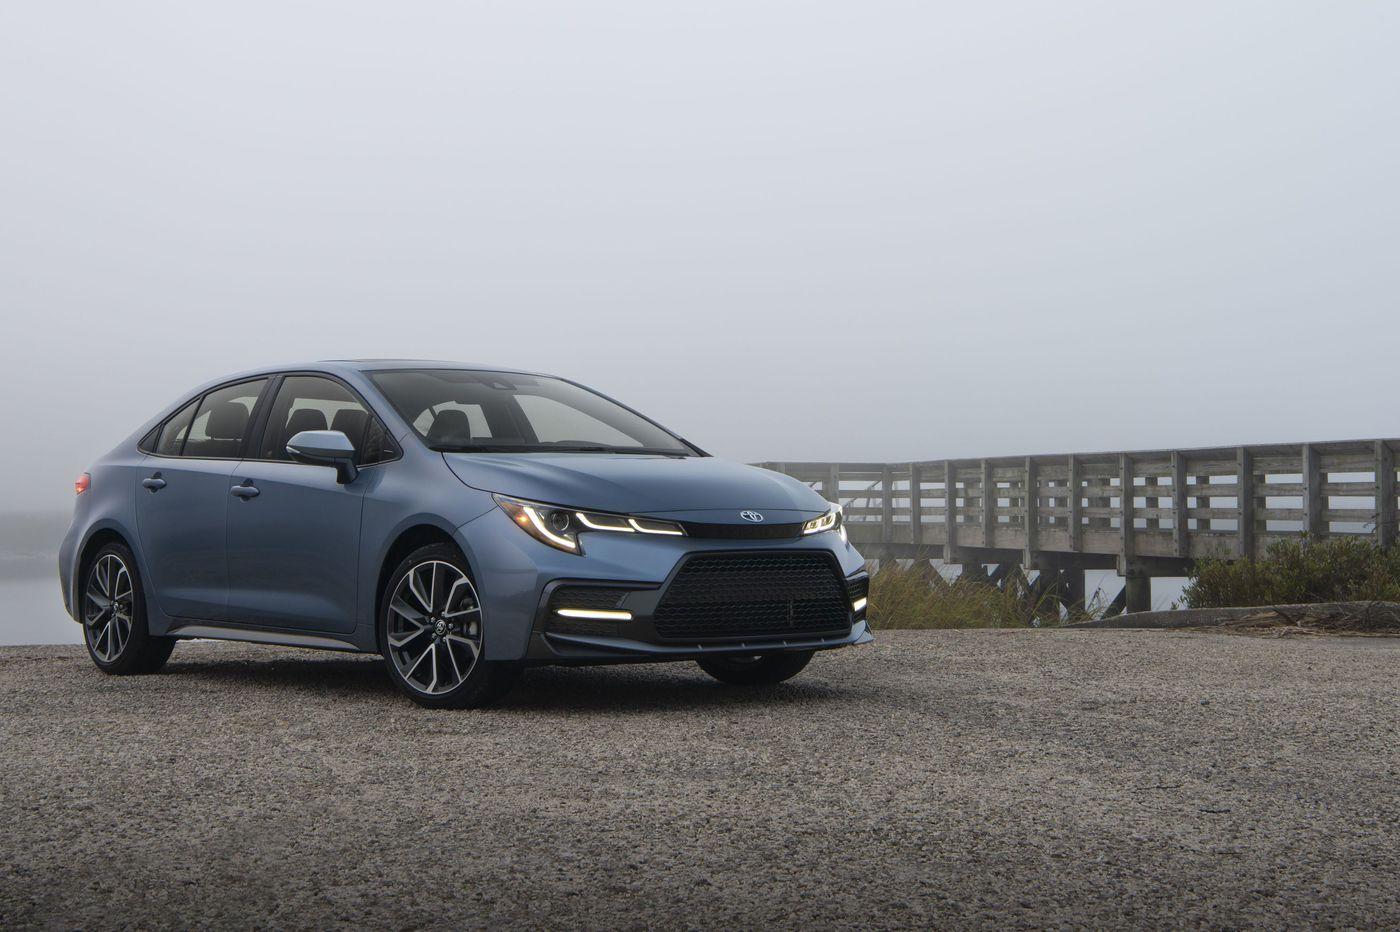 Toyota Corolla XSE: When mundane small cars liven up, Part 1